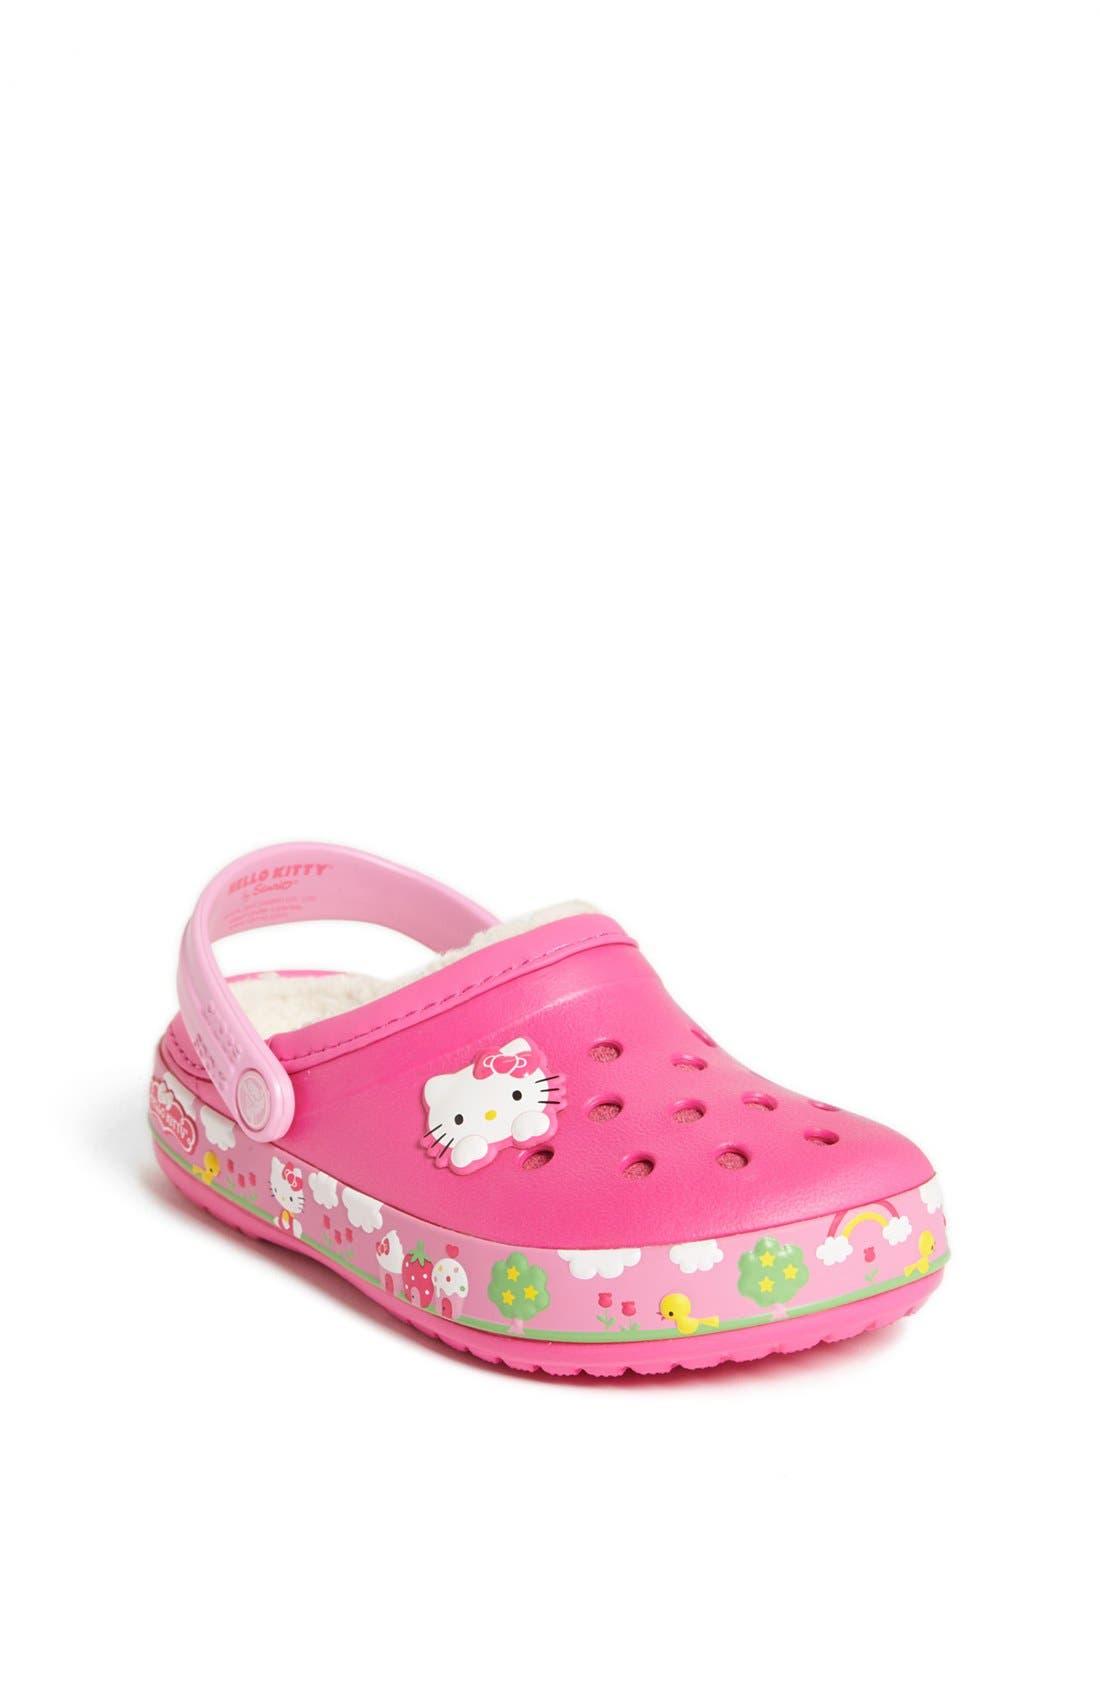 Main Image - CROCS™ 'Mammoth - Hello Kitty®' Clog (Walker & Toddler)